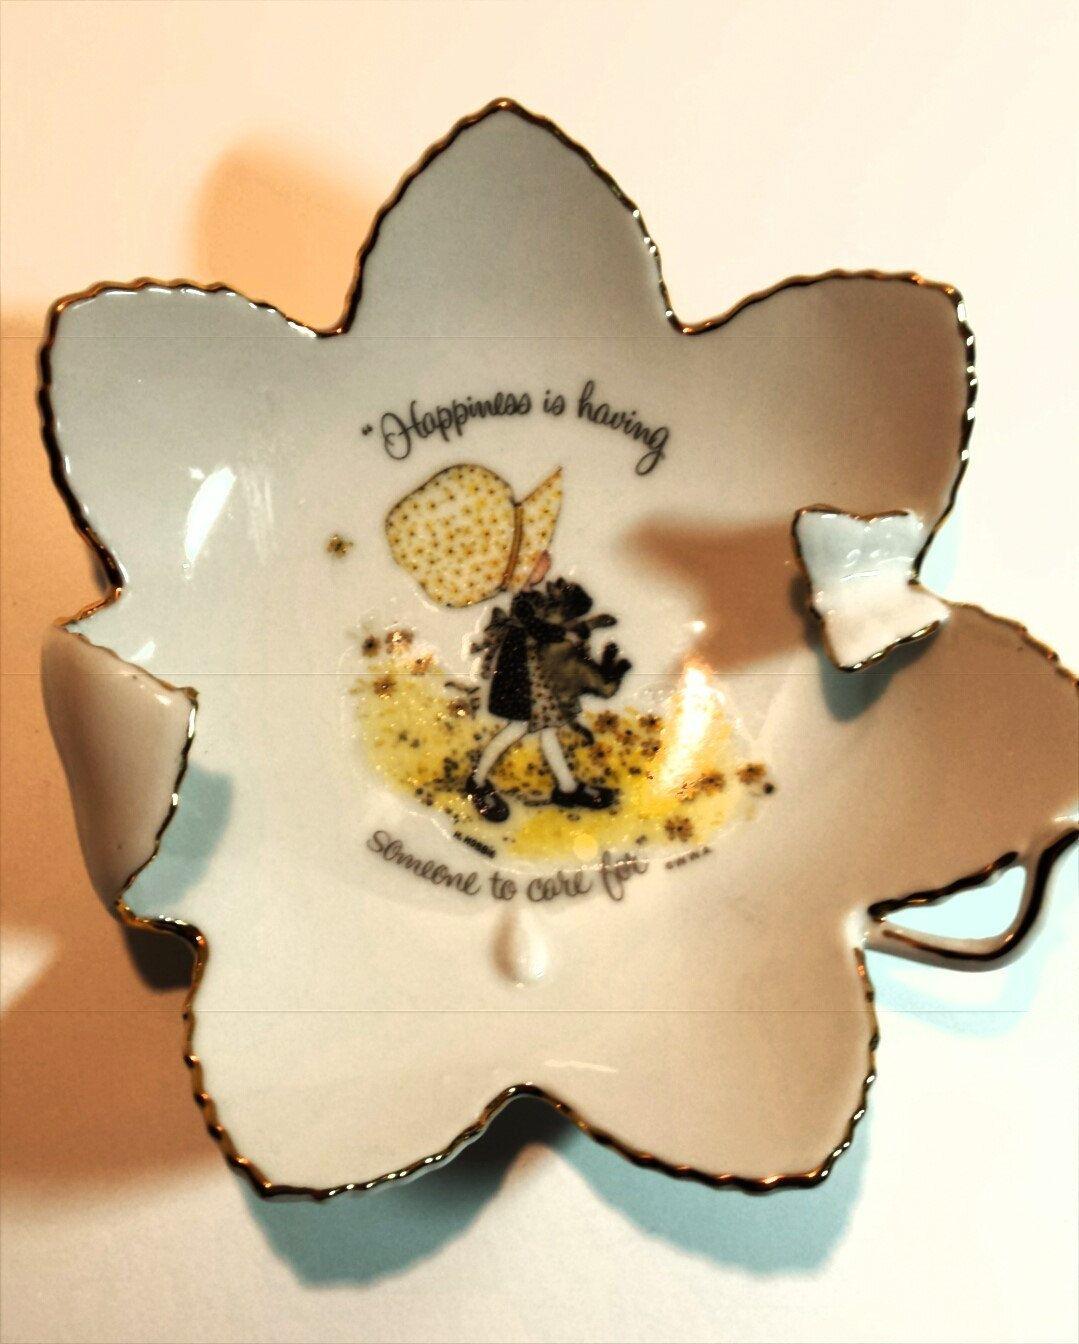 Holly hobbie porcelain trinket dish flower shaped with butterfly holly hobbie porcelain trinket dish flower shaped with butterfly world wide arts inc 1973 reviewsmspy